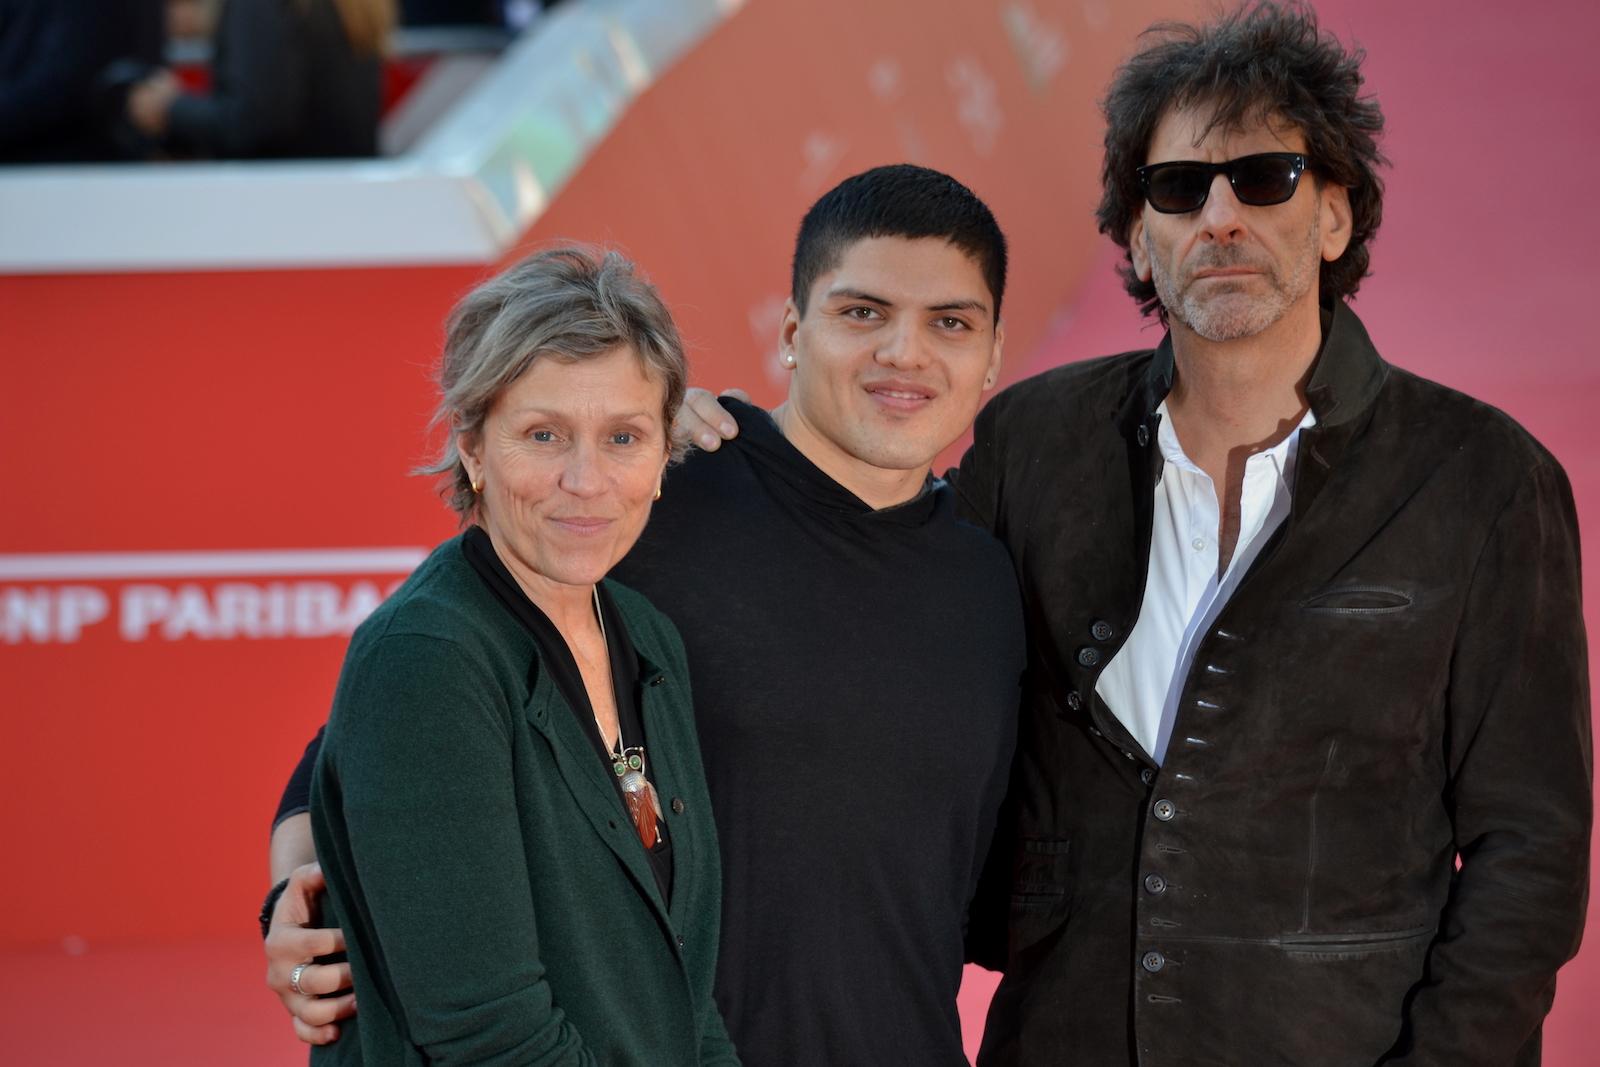 Roma 2015: Frances McDornand e Joel Coen mentre posano per i fotografi sul red carpet